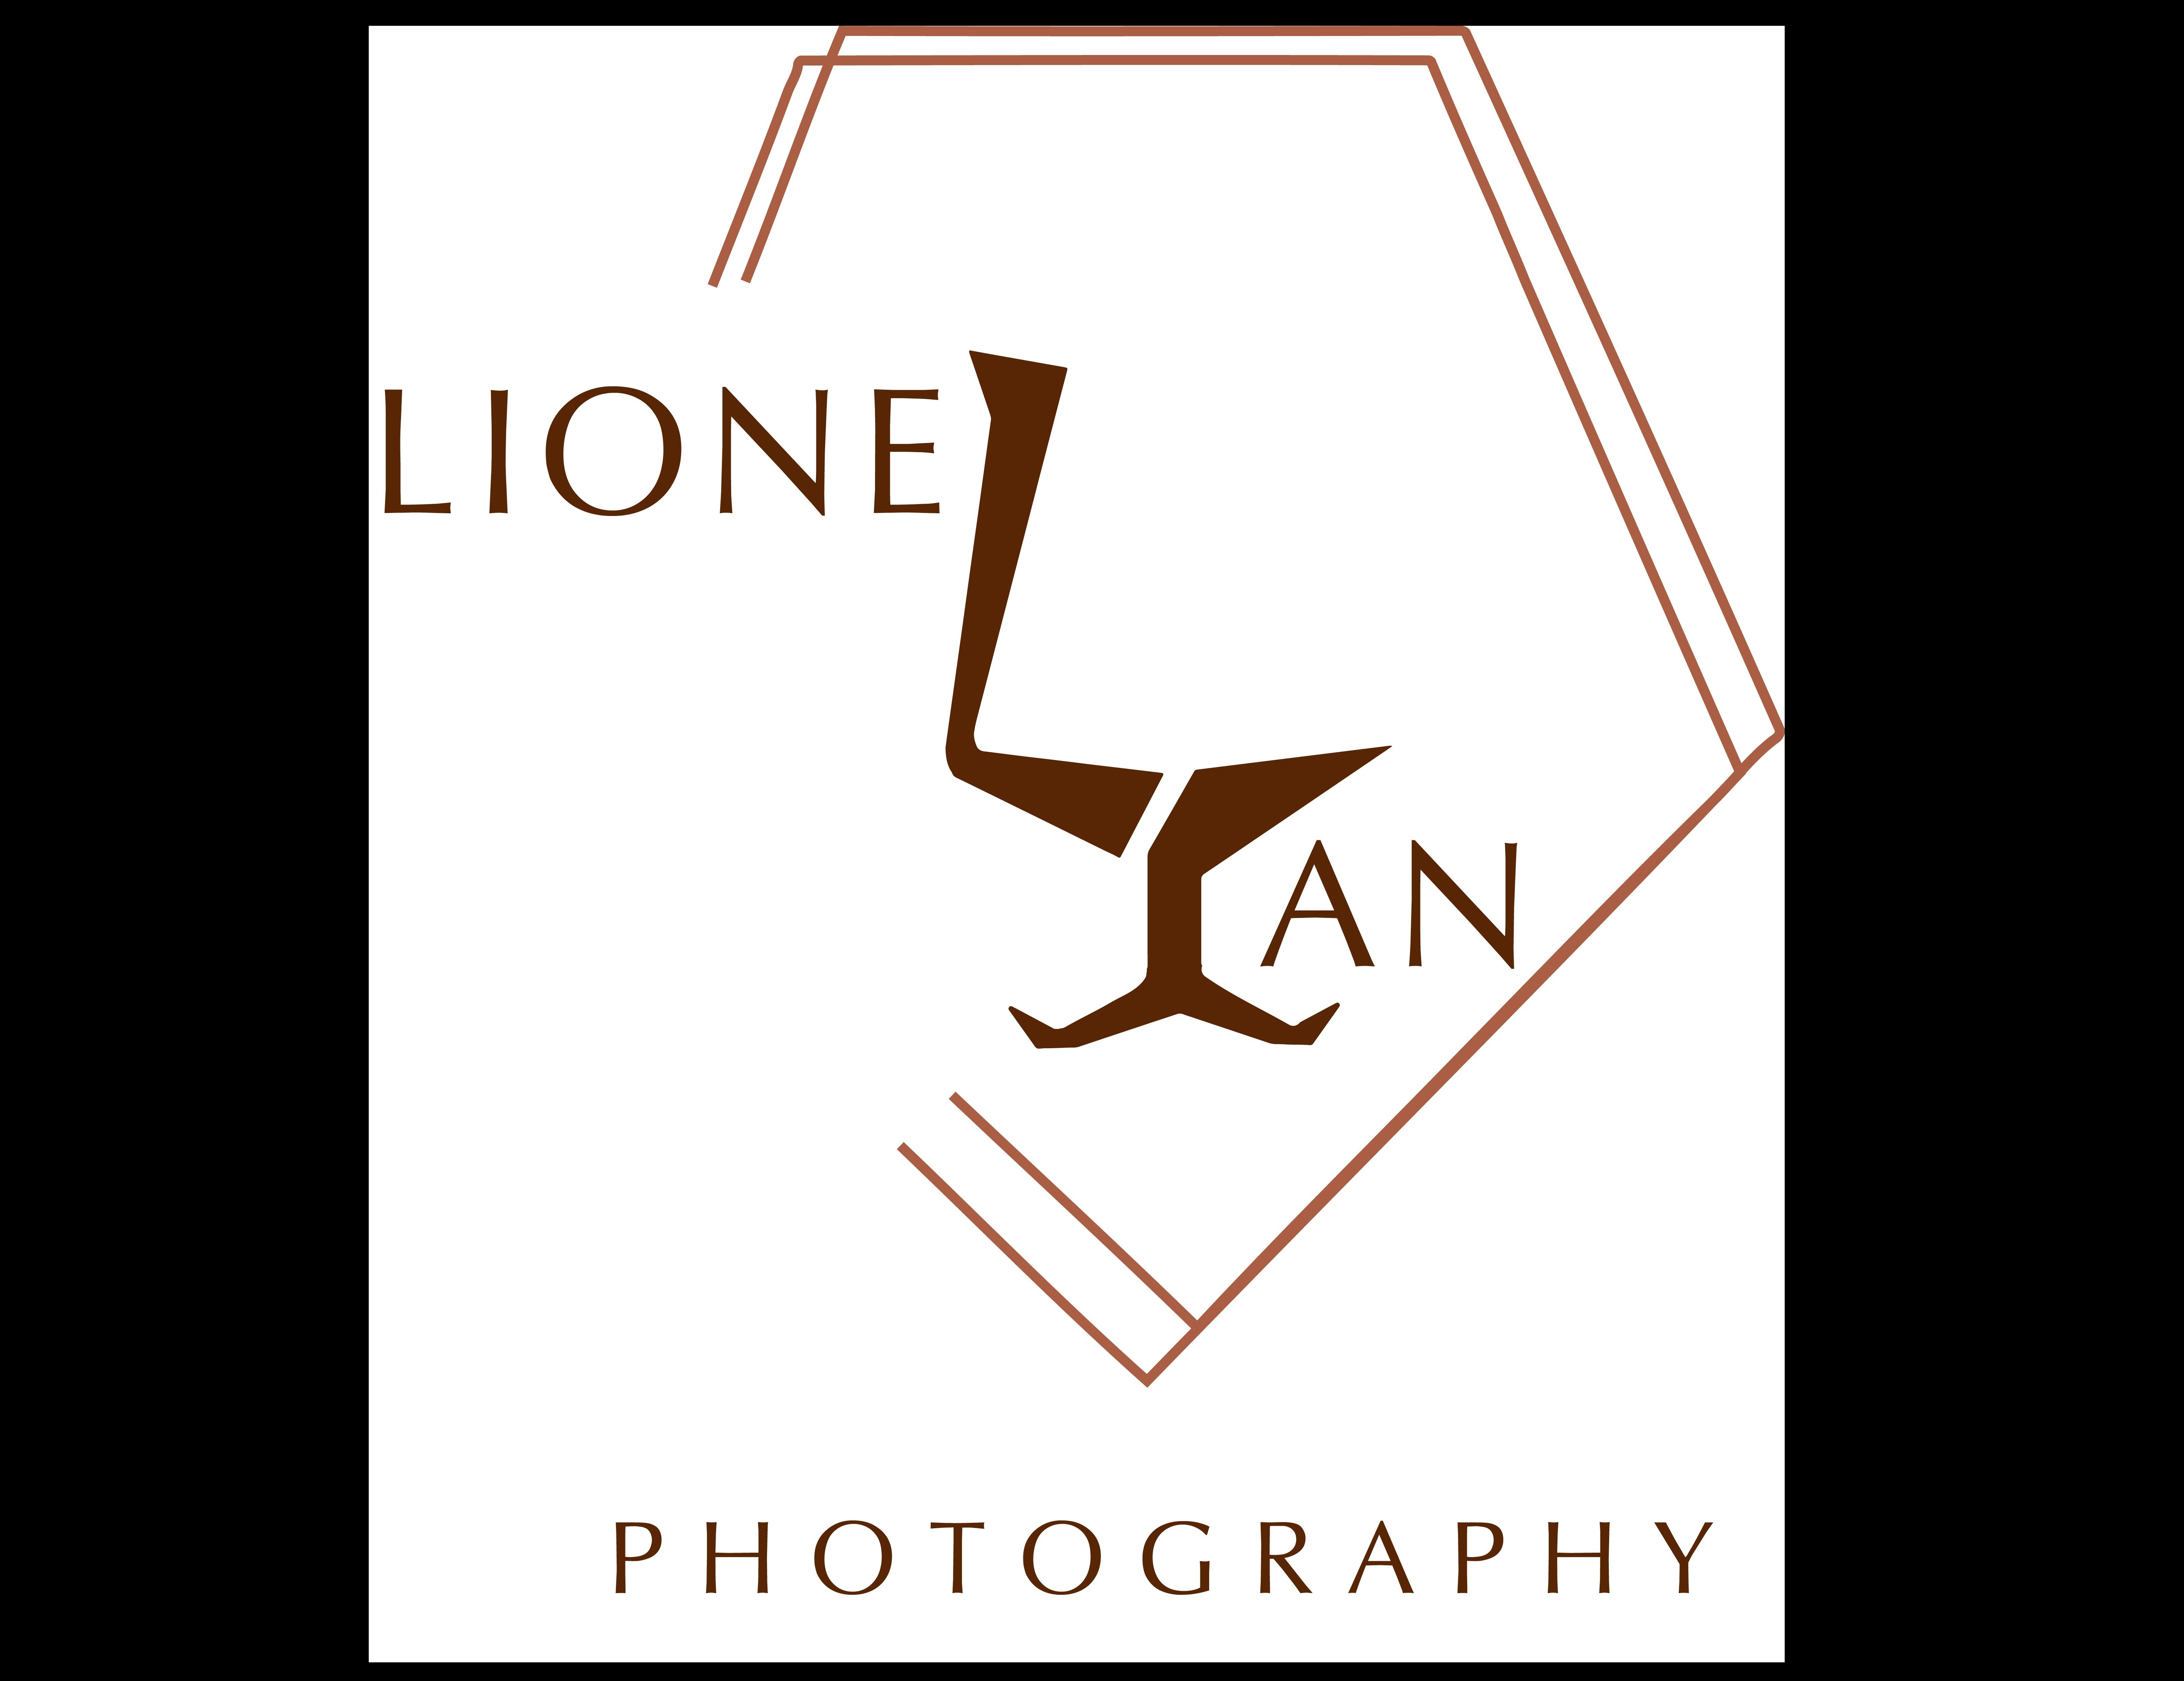 Lionel Tan Wedding Photography